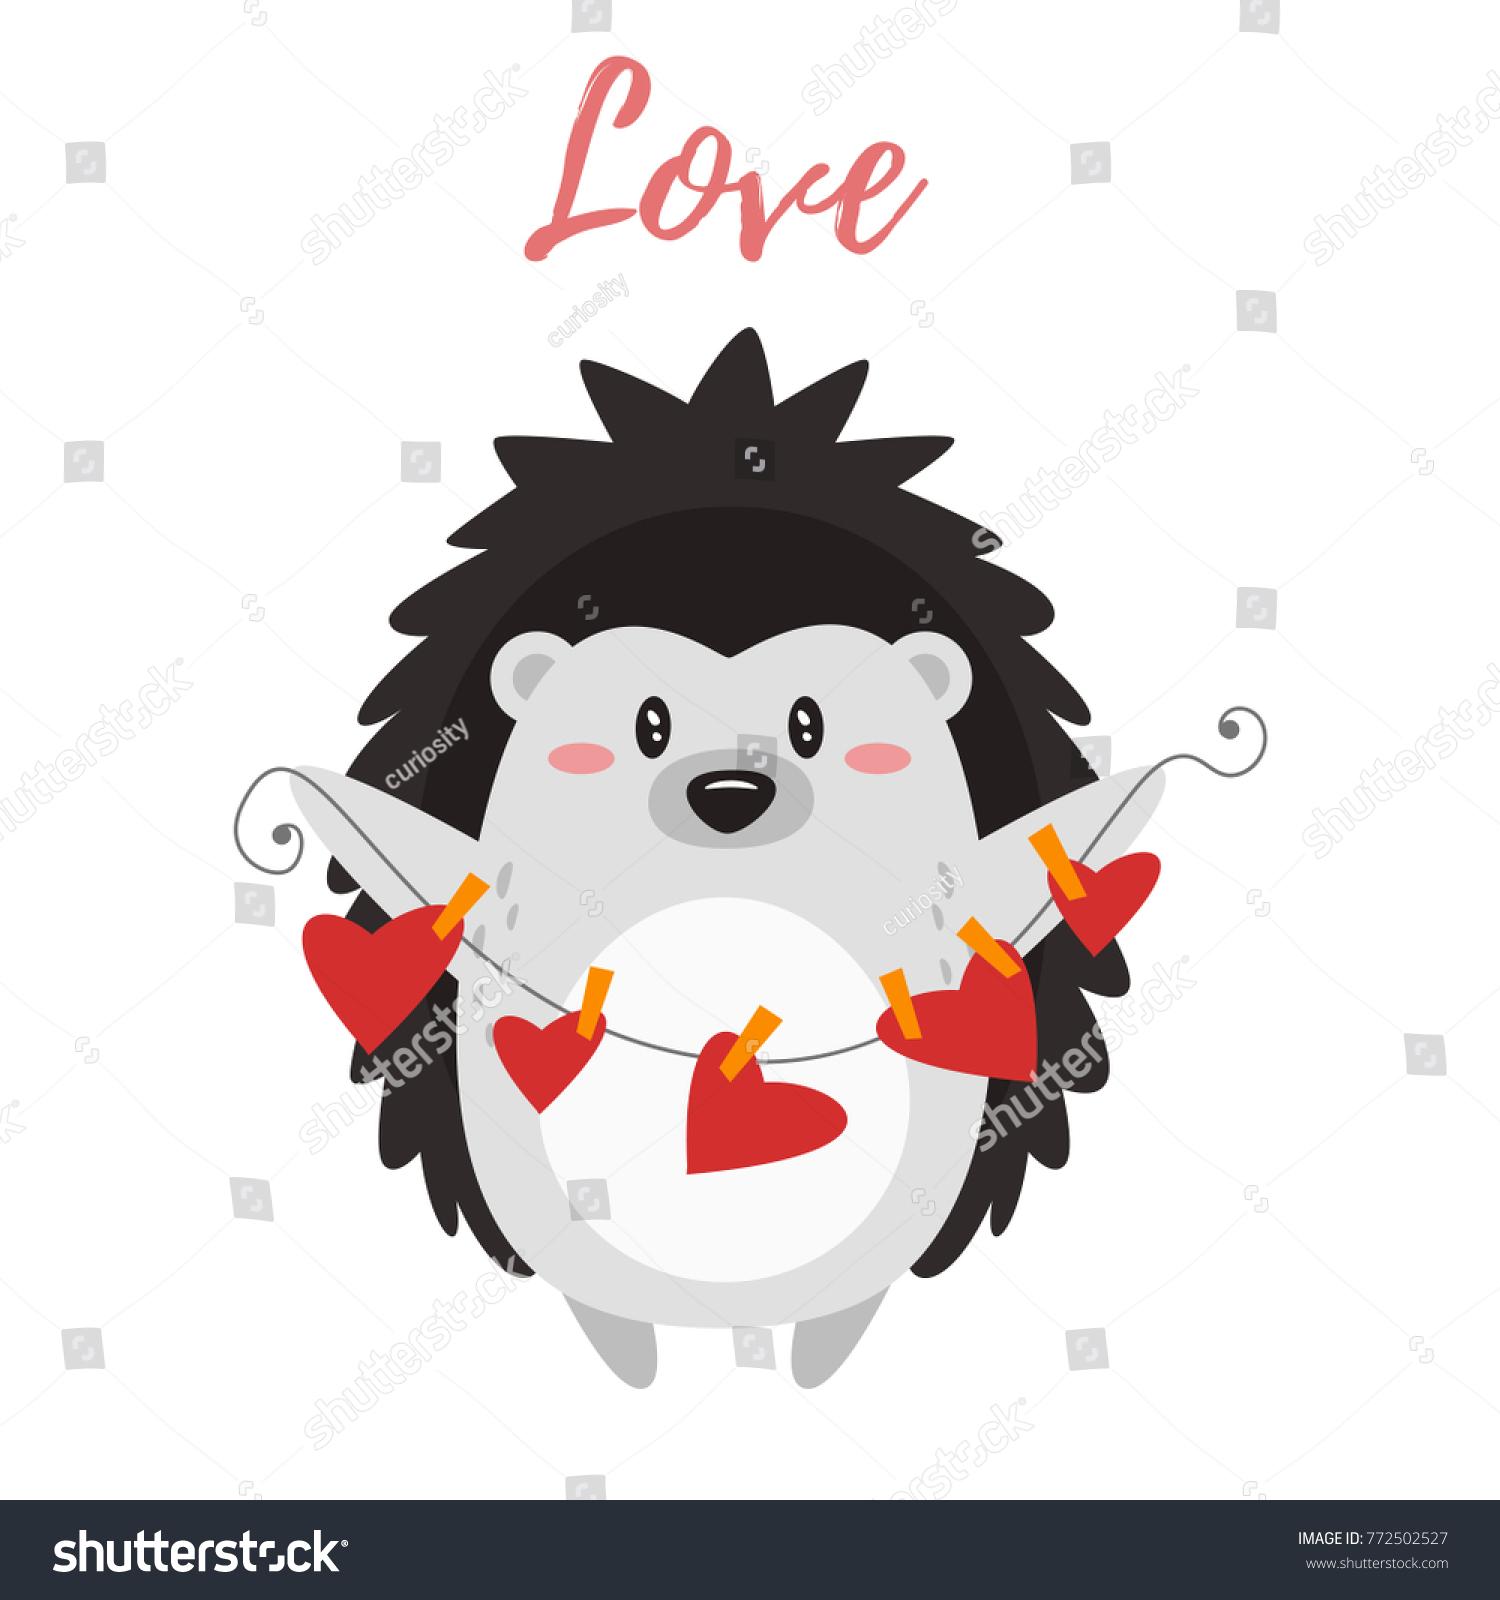 vector cartoon style illustration valentines day stock vector 772502527 shutterstock